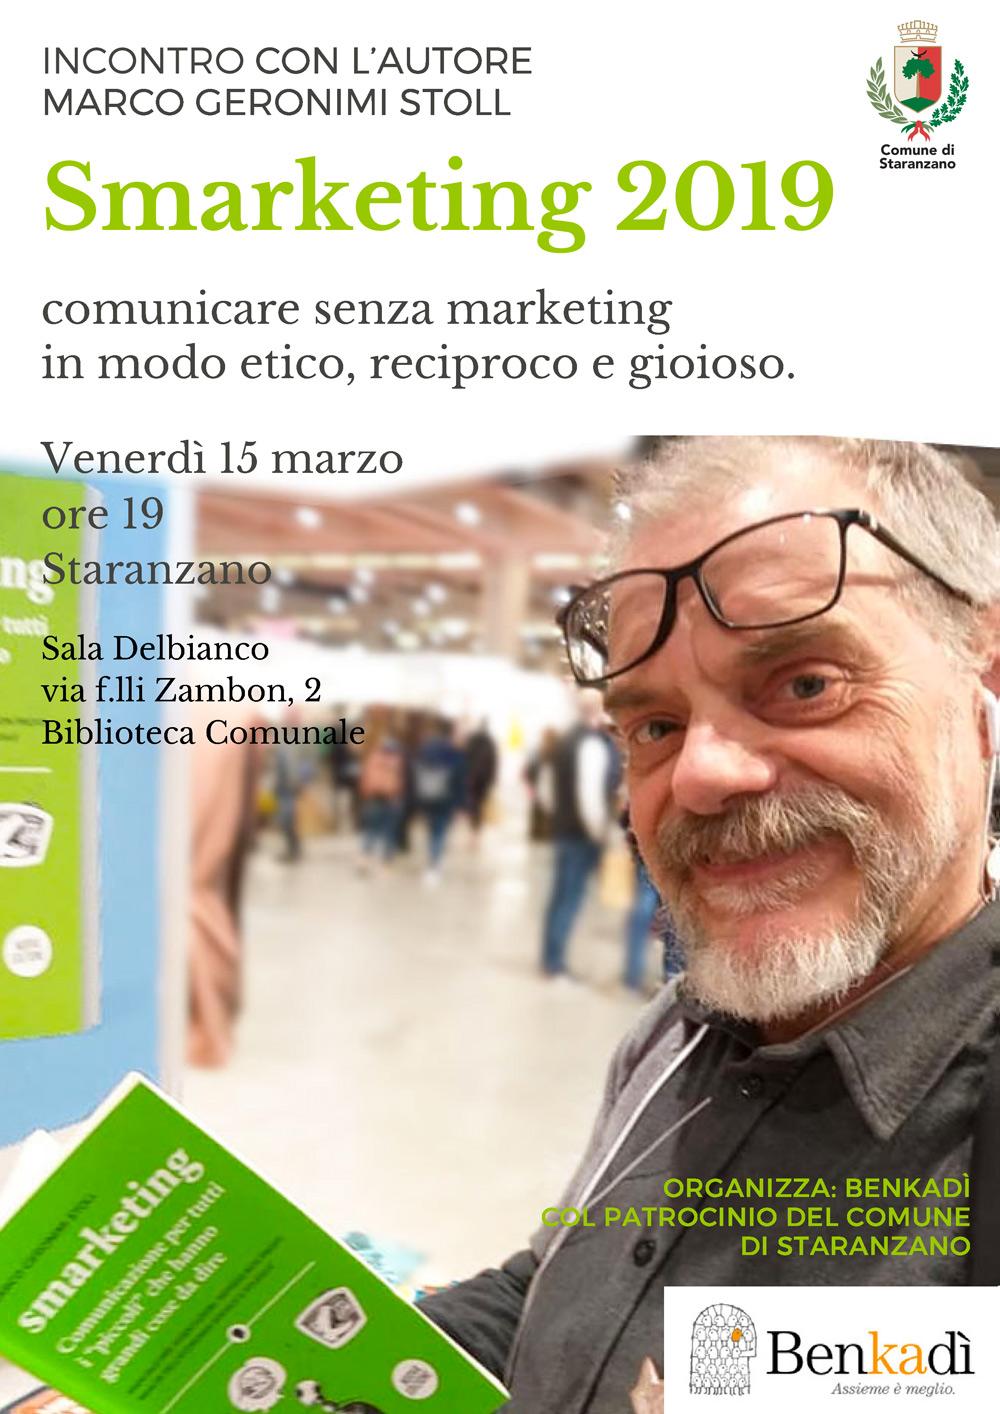 Smarketing nuova edizione locandina Staranzano